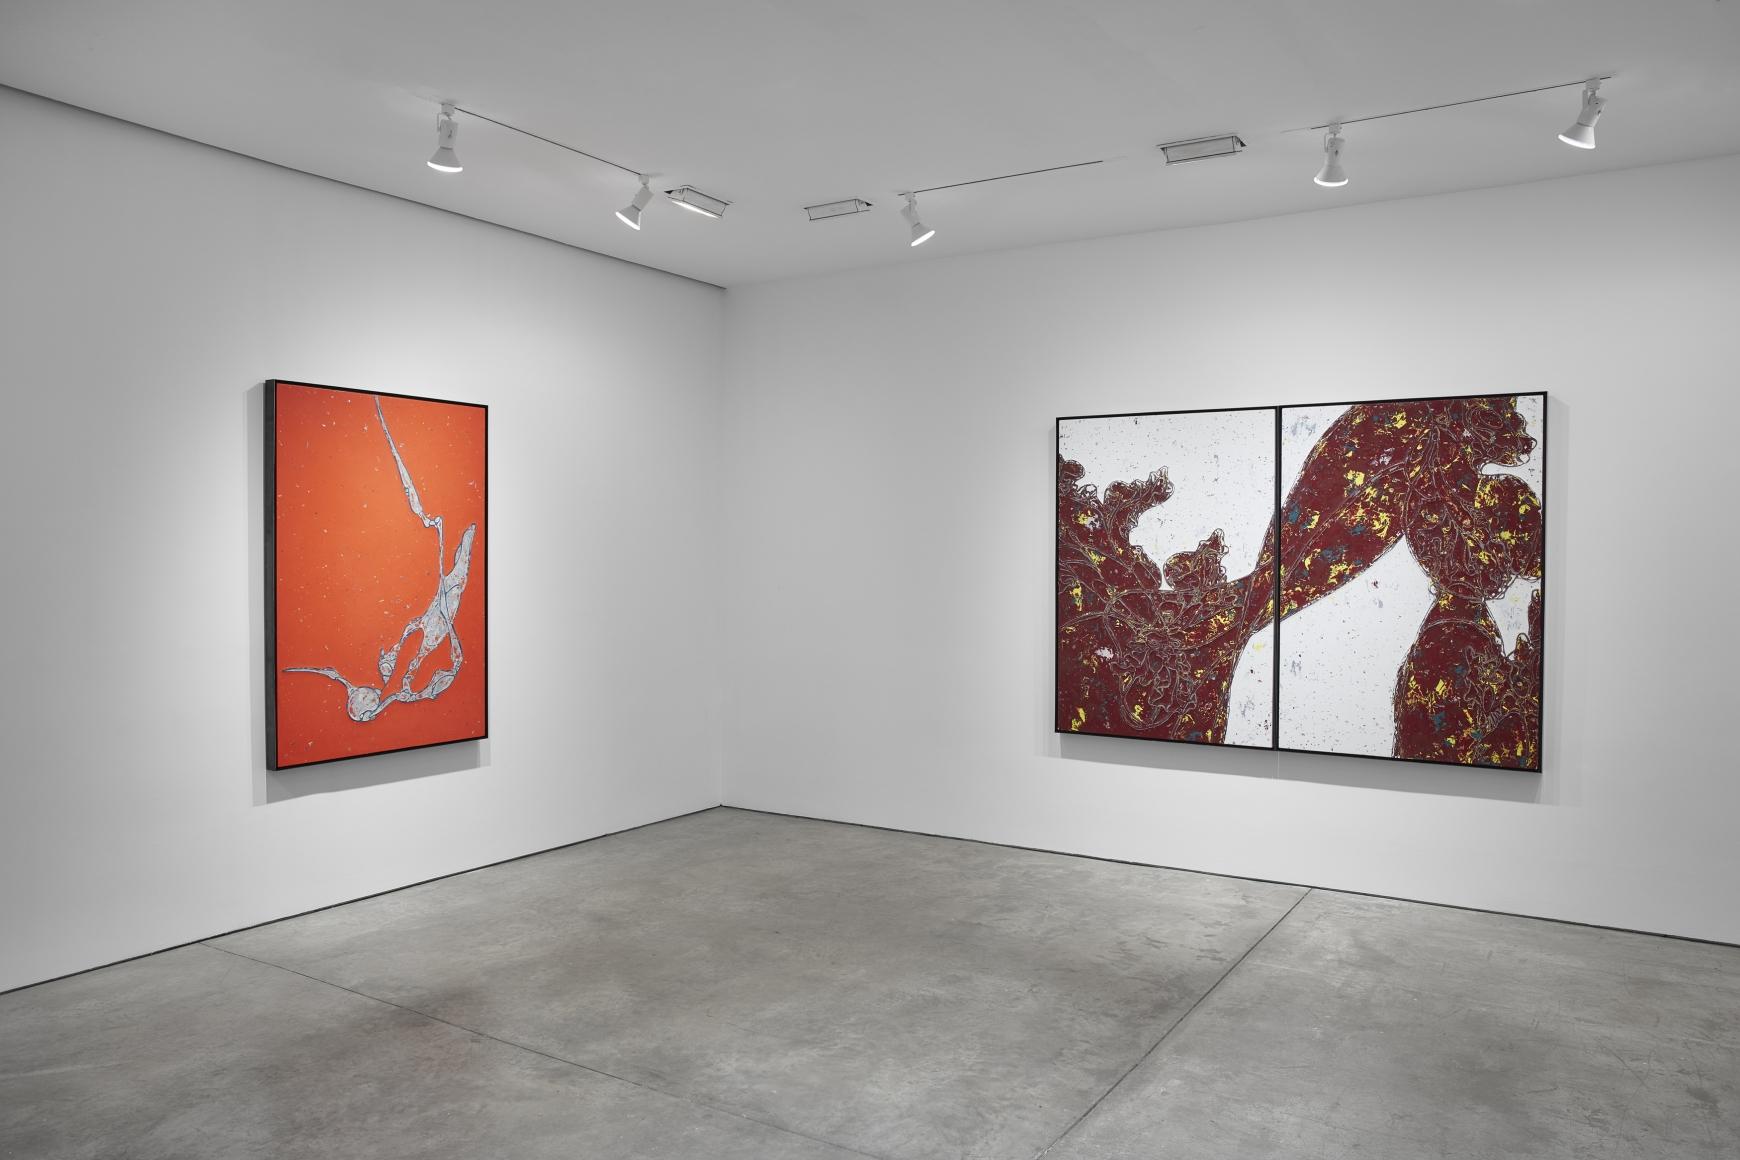 Lee Bul, Interlude: Perdu Installation view 2